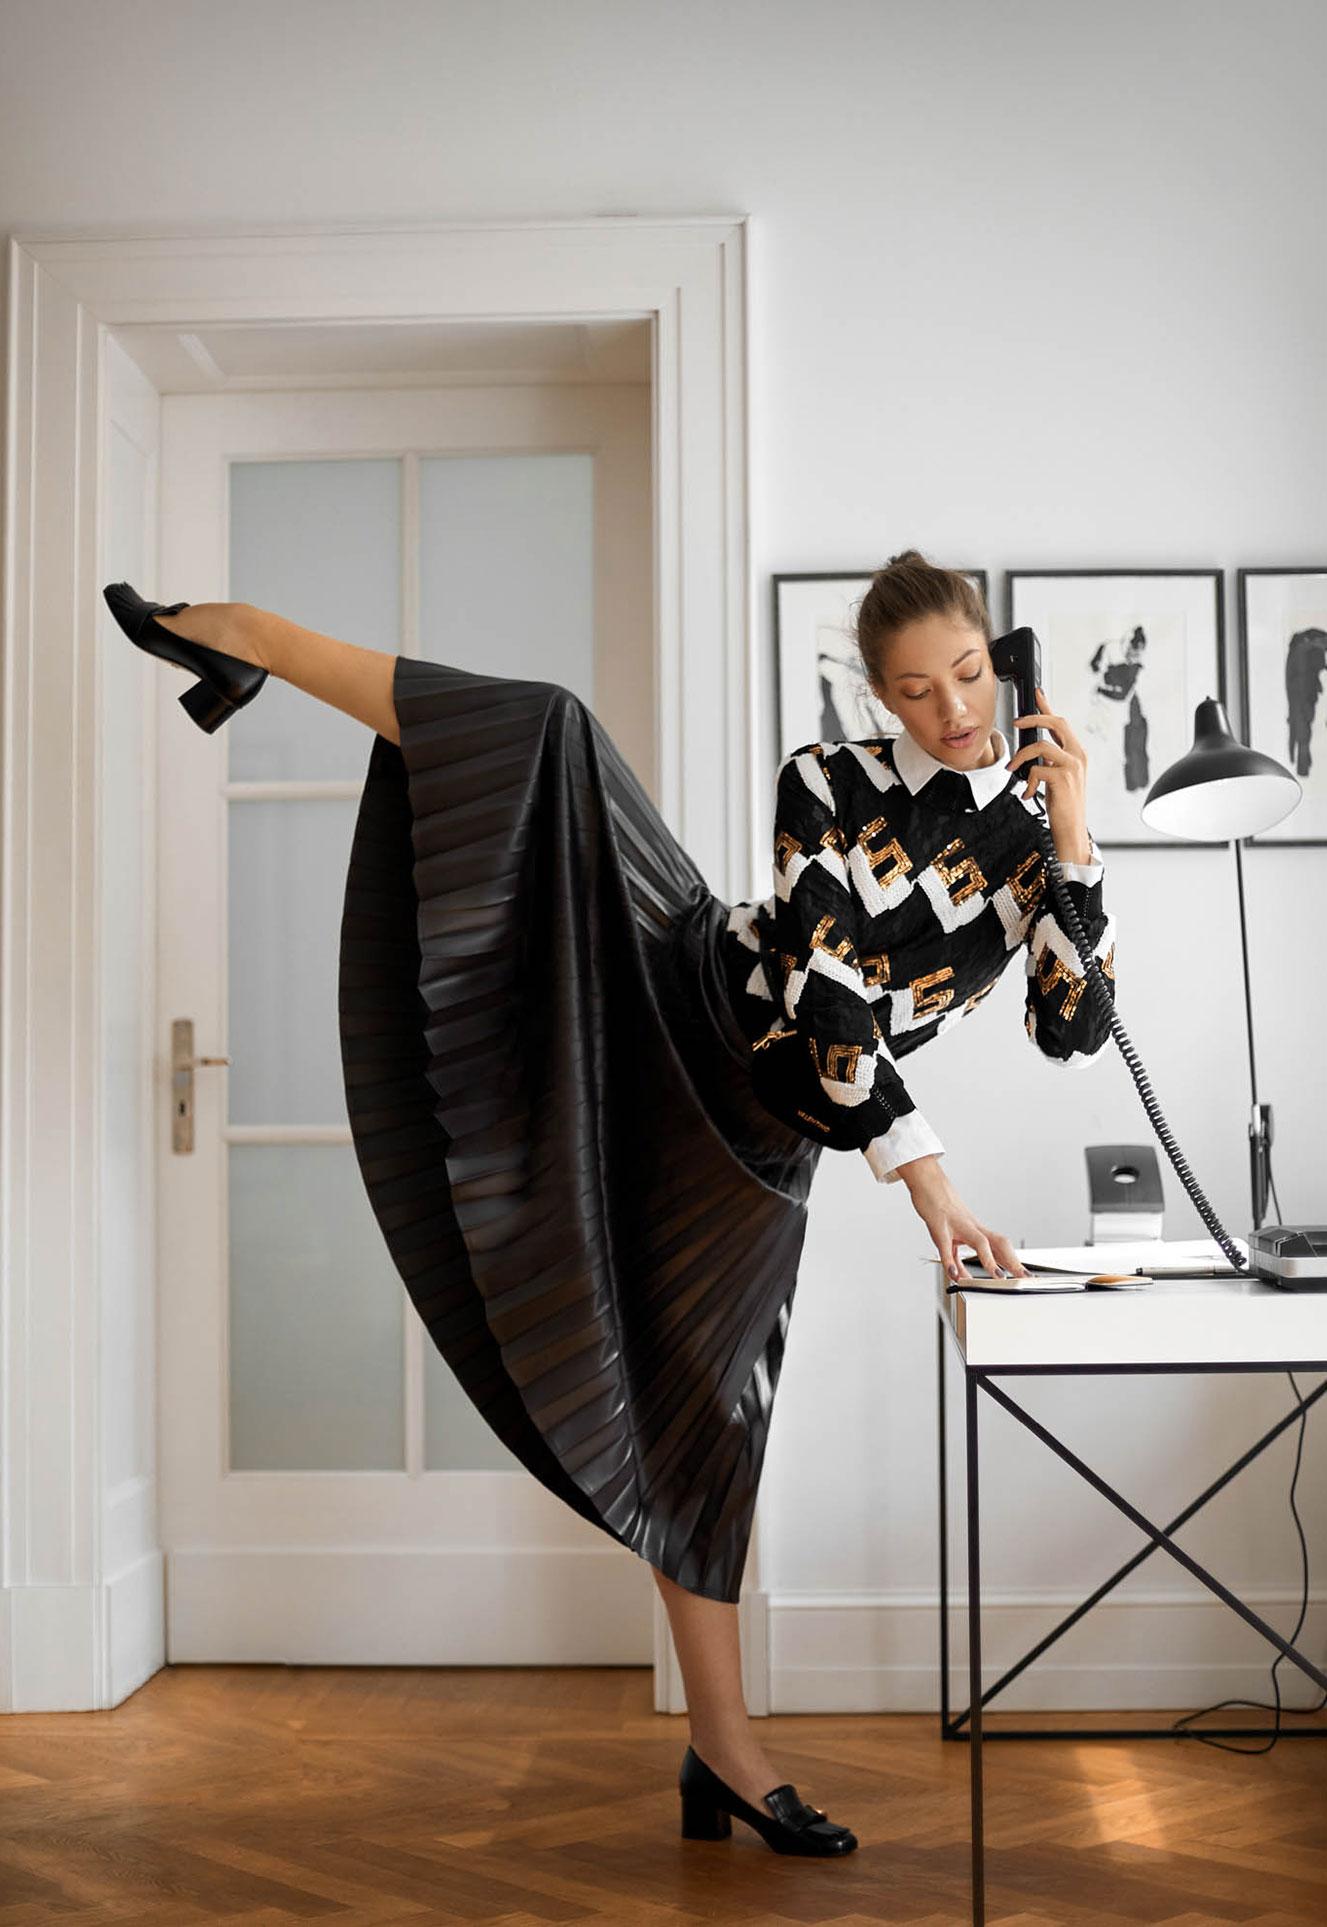 Винтажный офис-менеджер / Georgeta Varvarici by Anita Bresser